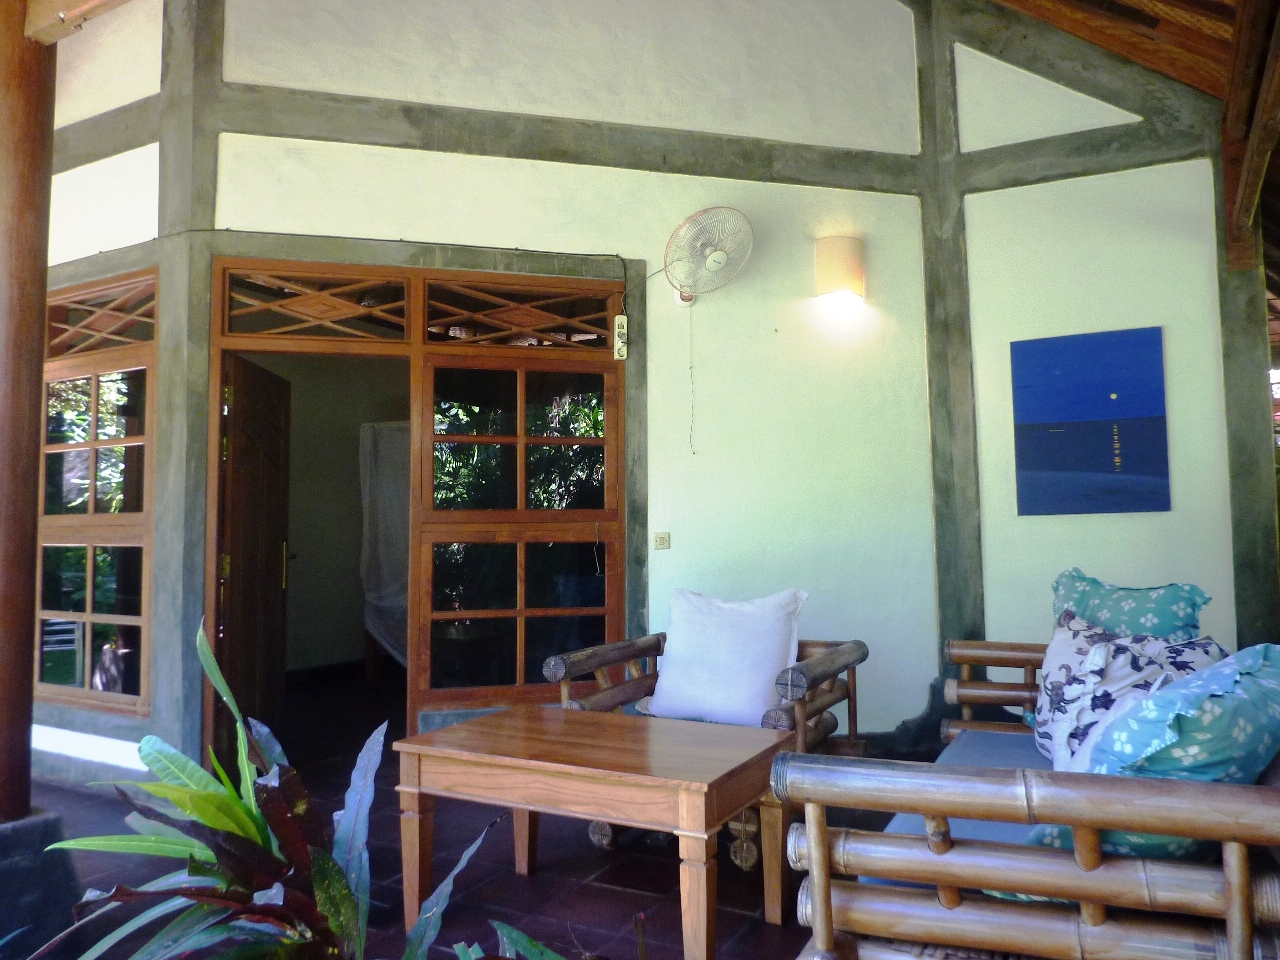 Veranda of the small bungalow